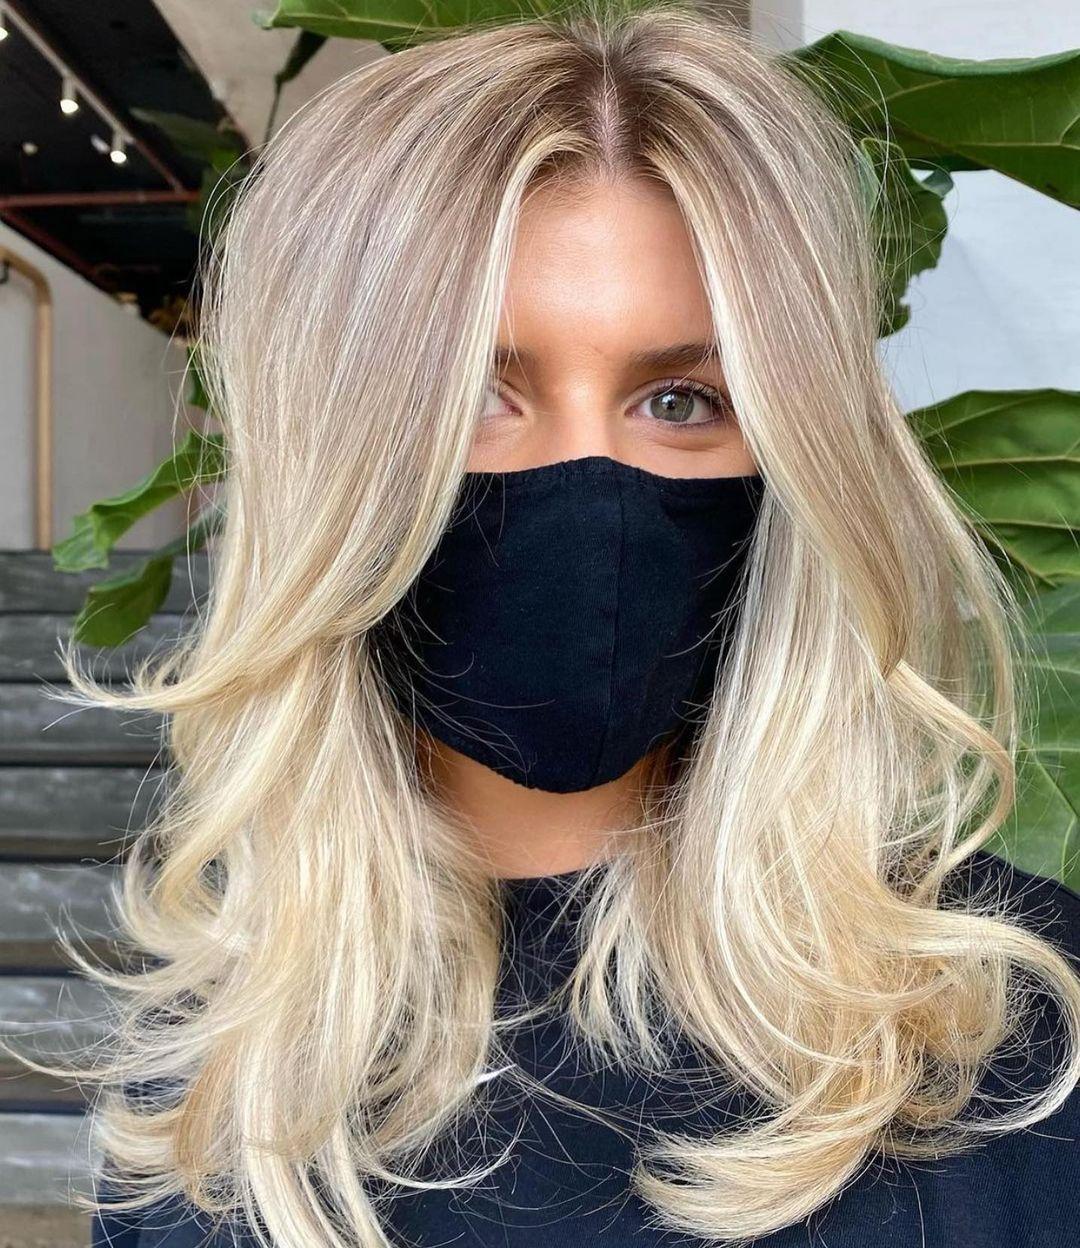 Medium Blonde Hairstyle for Women